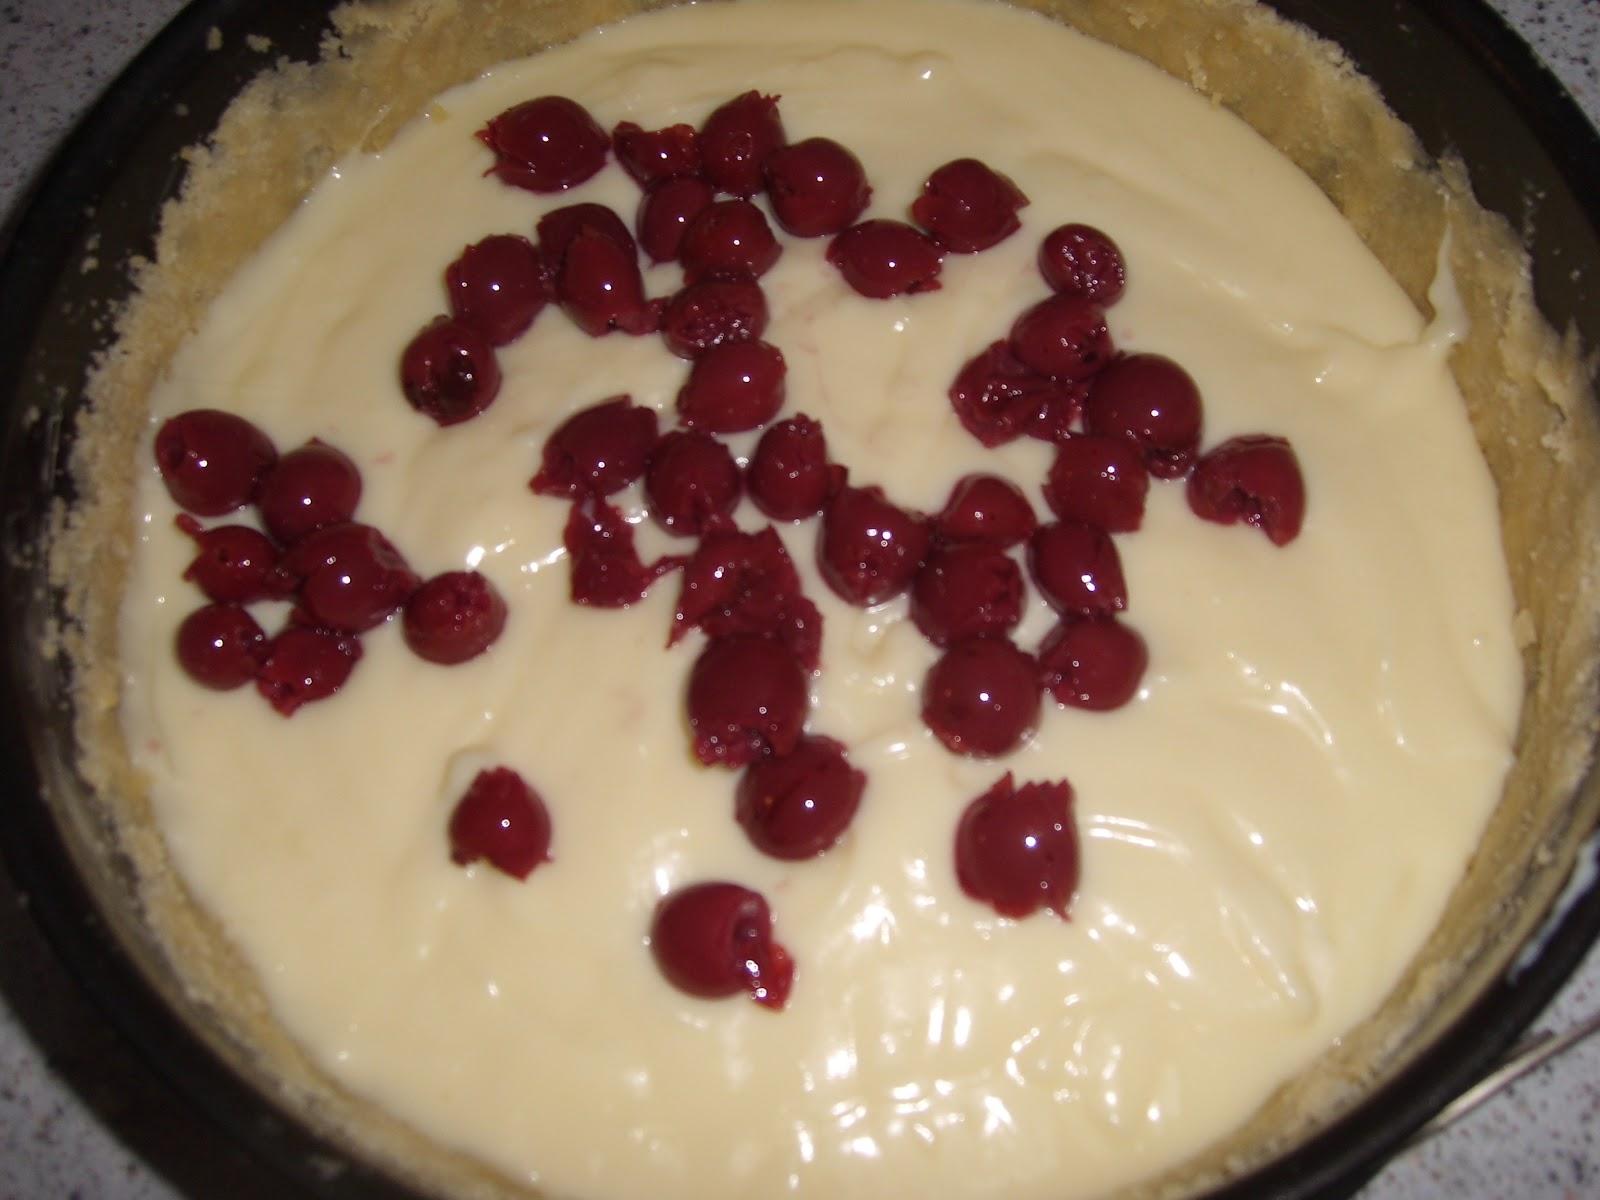 Creme Kuchen Creme Fraiche Fullung Fur Kuchen Appetitlich Foto Blog